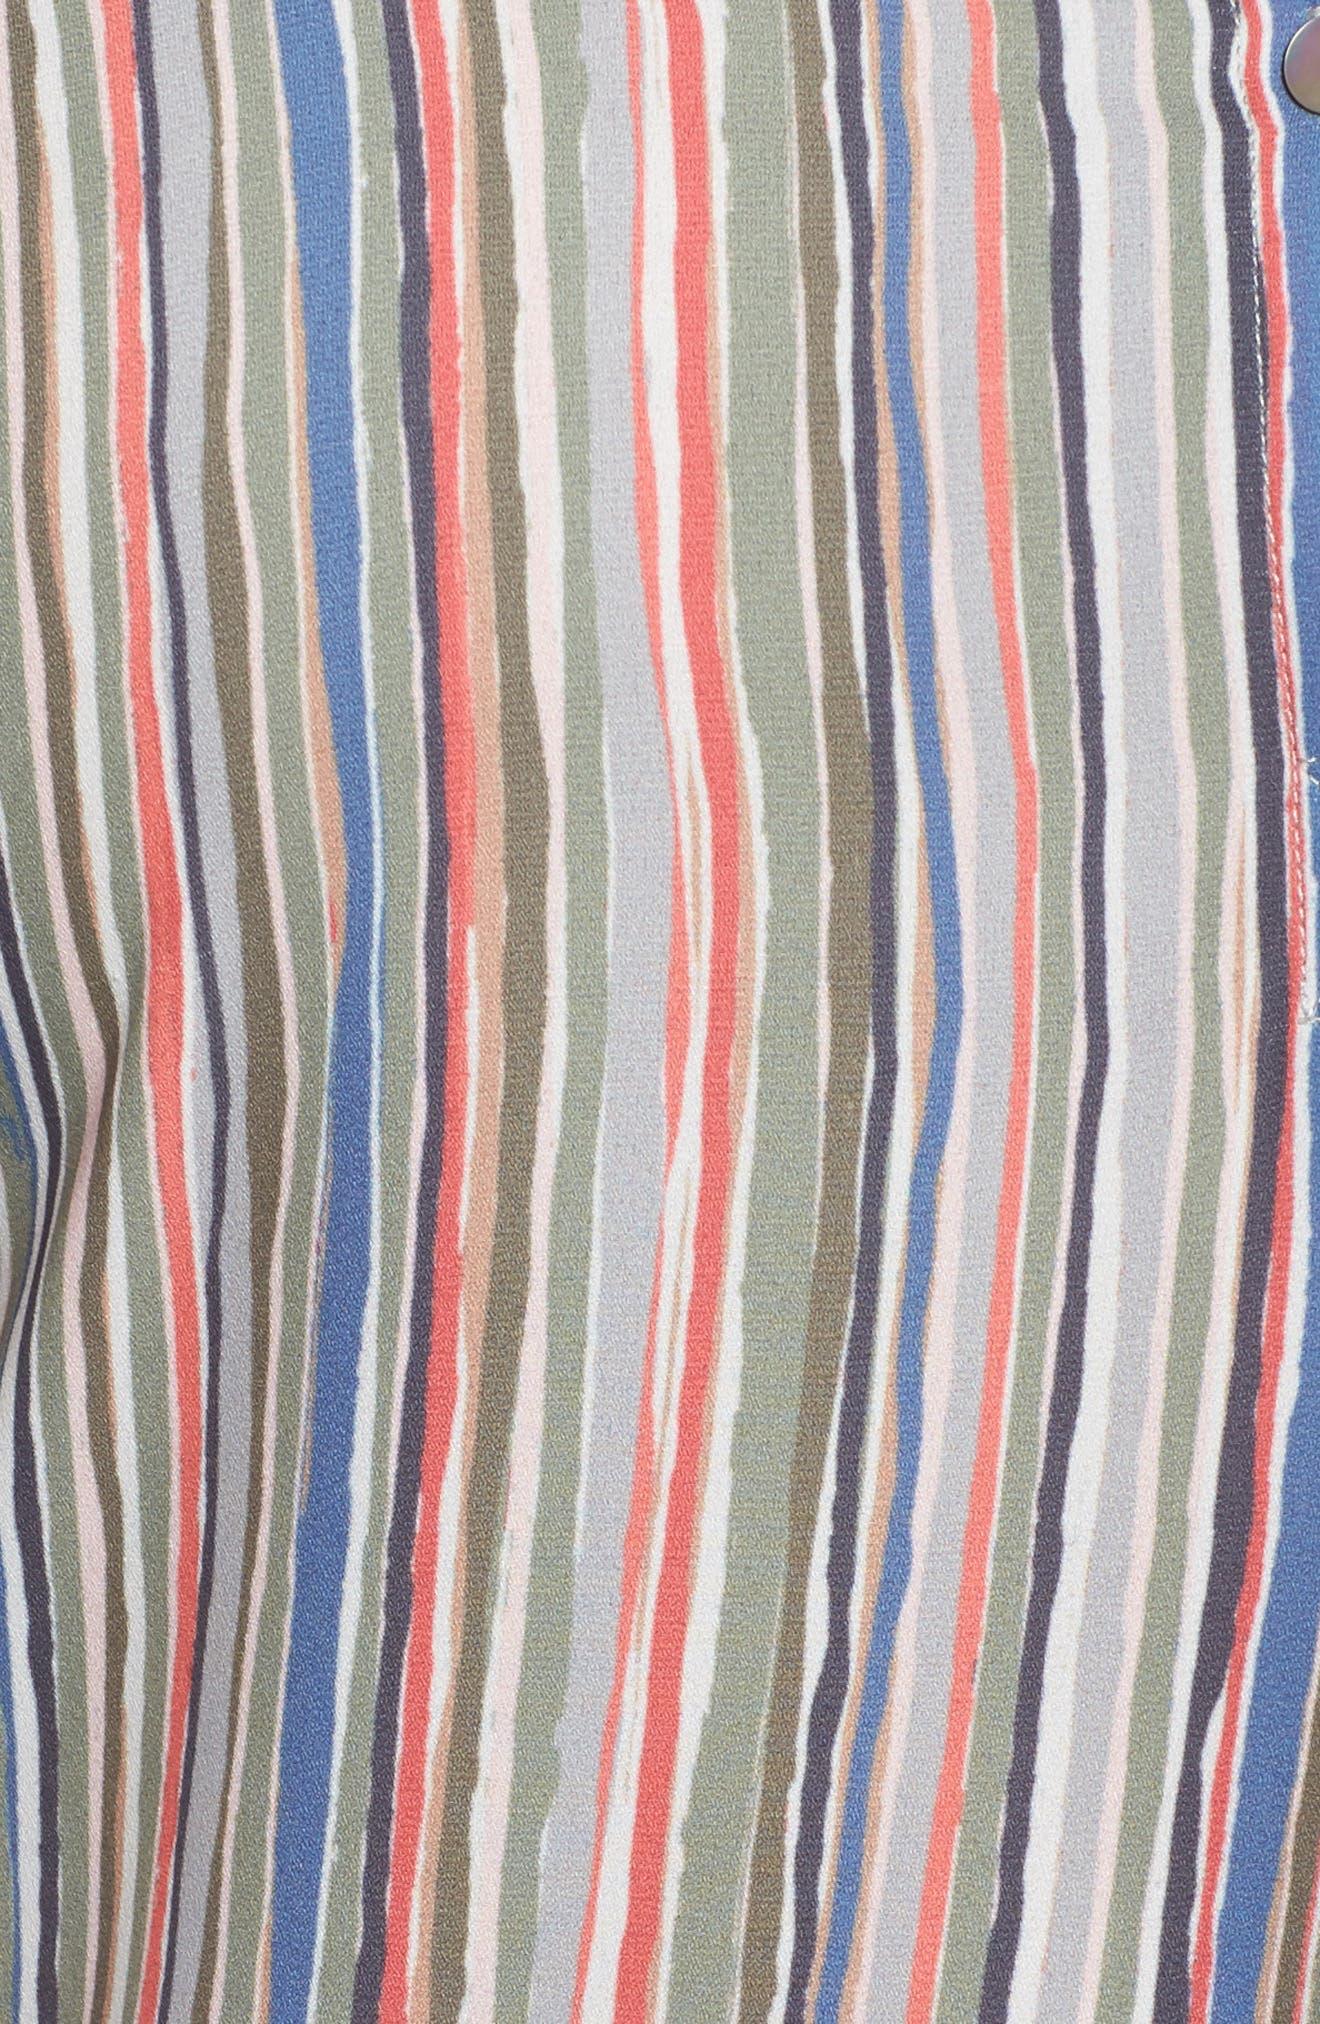 Cabana Tie Sleeve Top,                             Alternate thumbnail 5, color,                             Multi